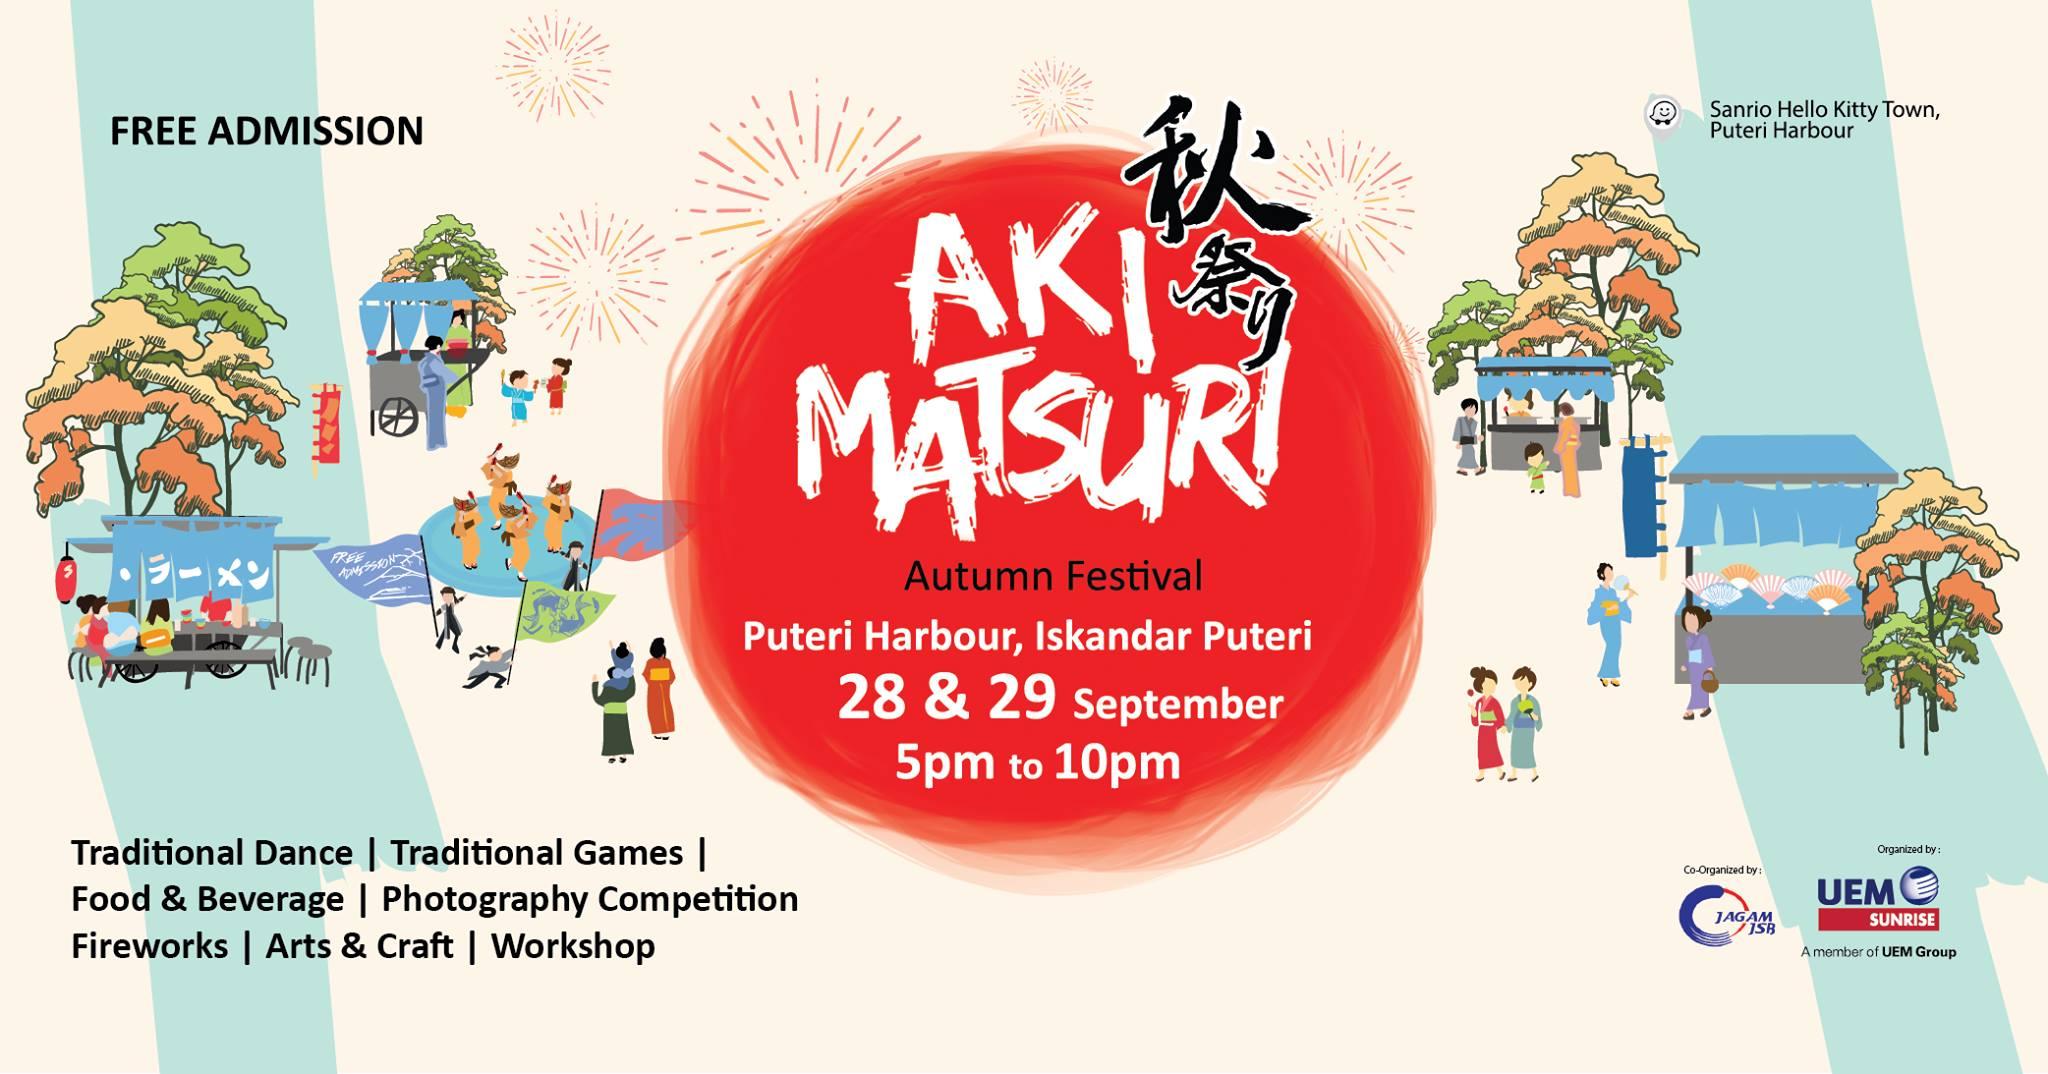 Aki Matsuri Autumn Festival 2019